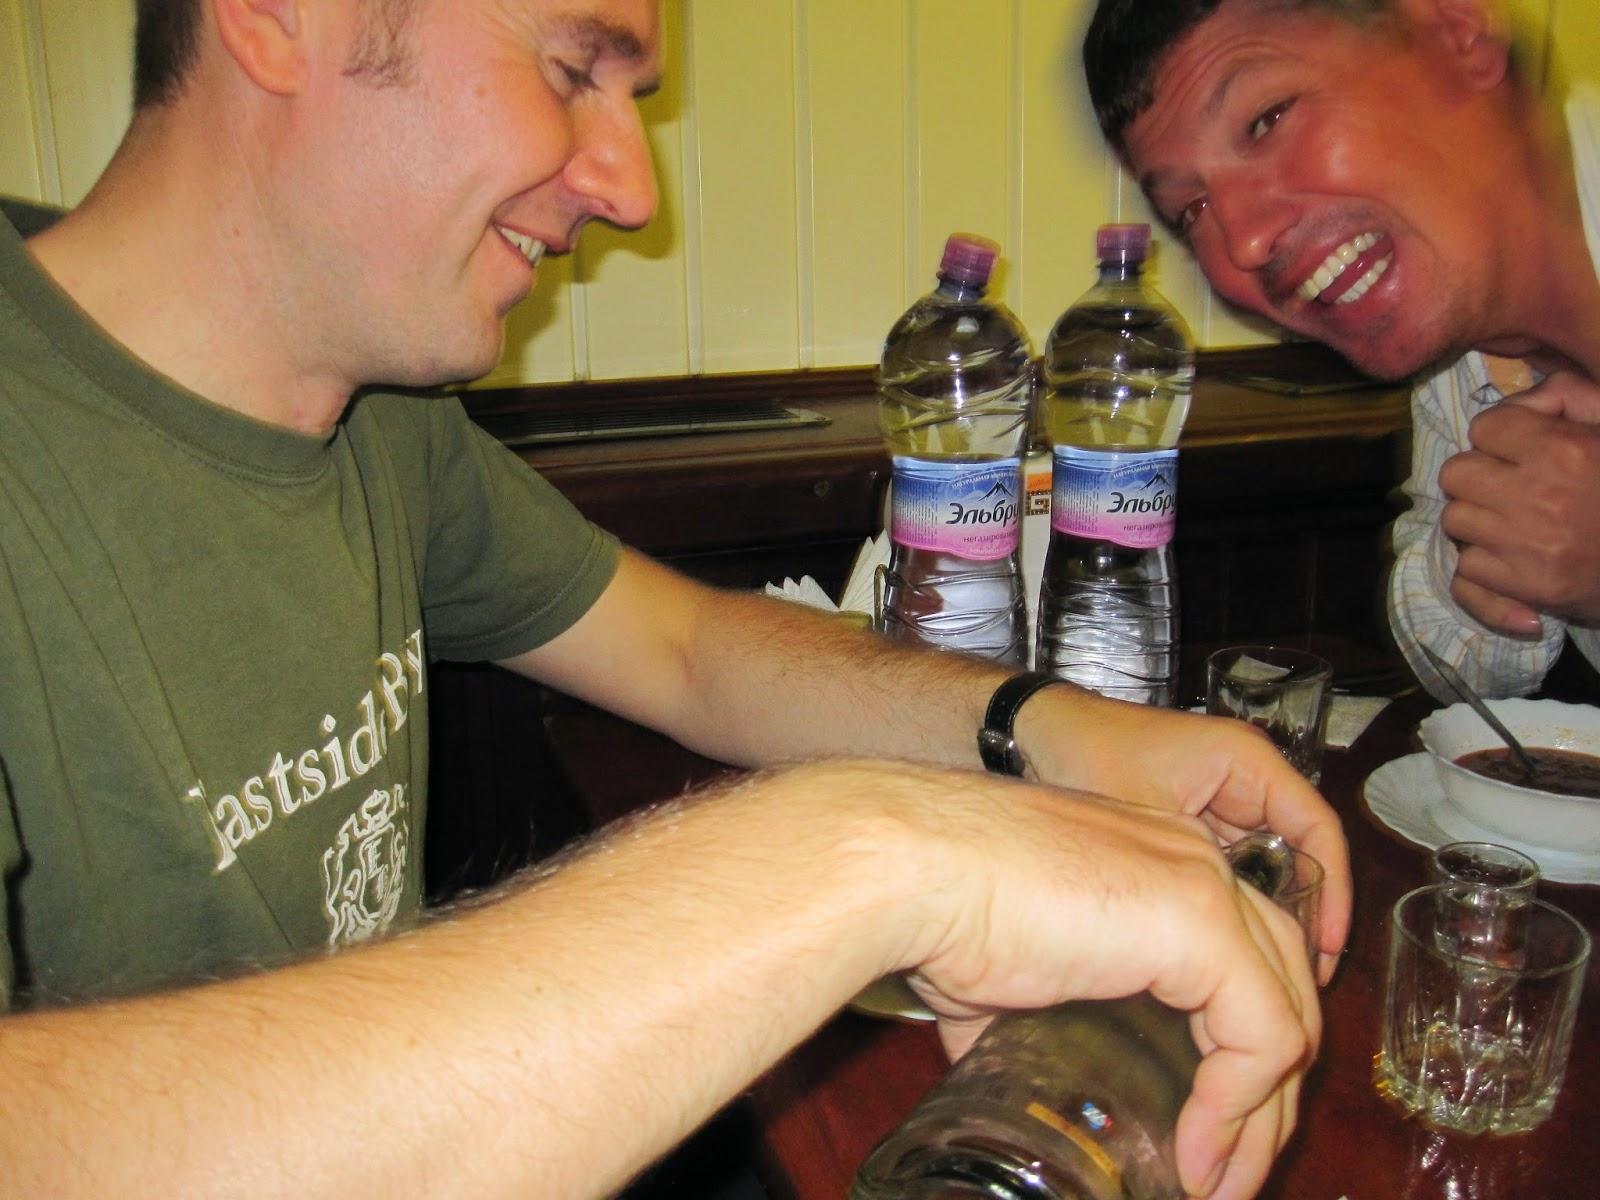 Getting drunk on vodka in Russia